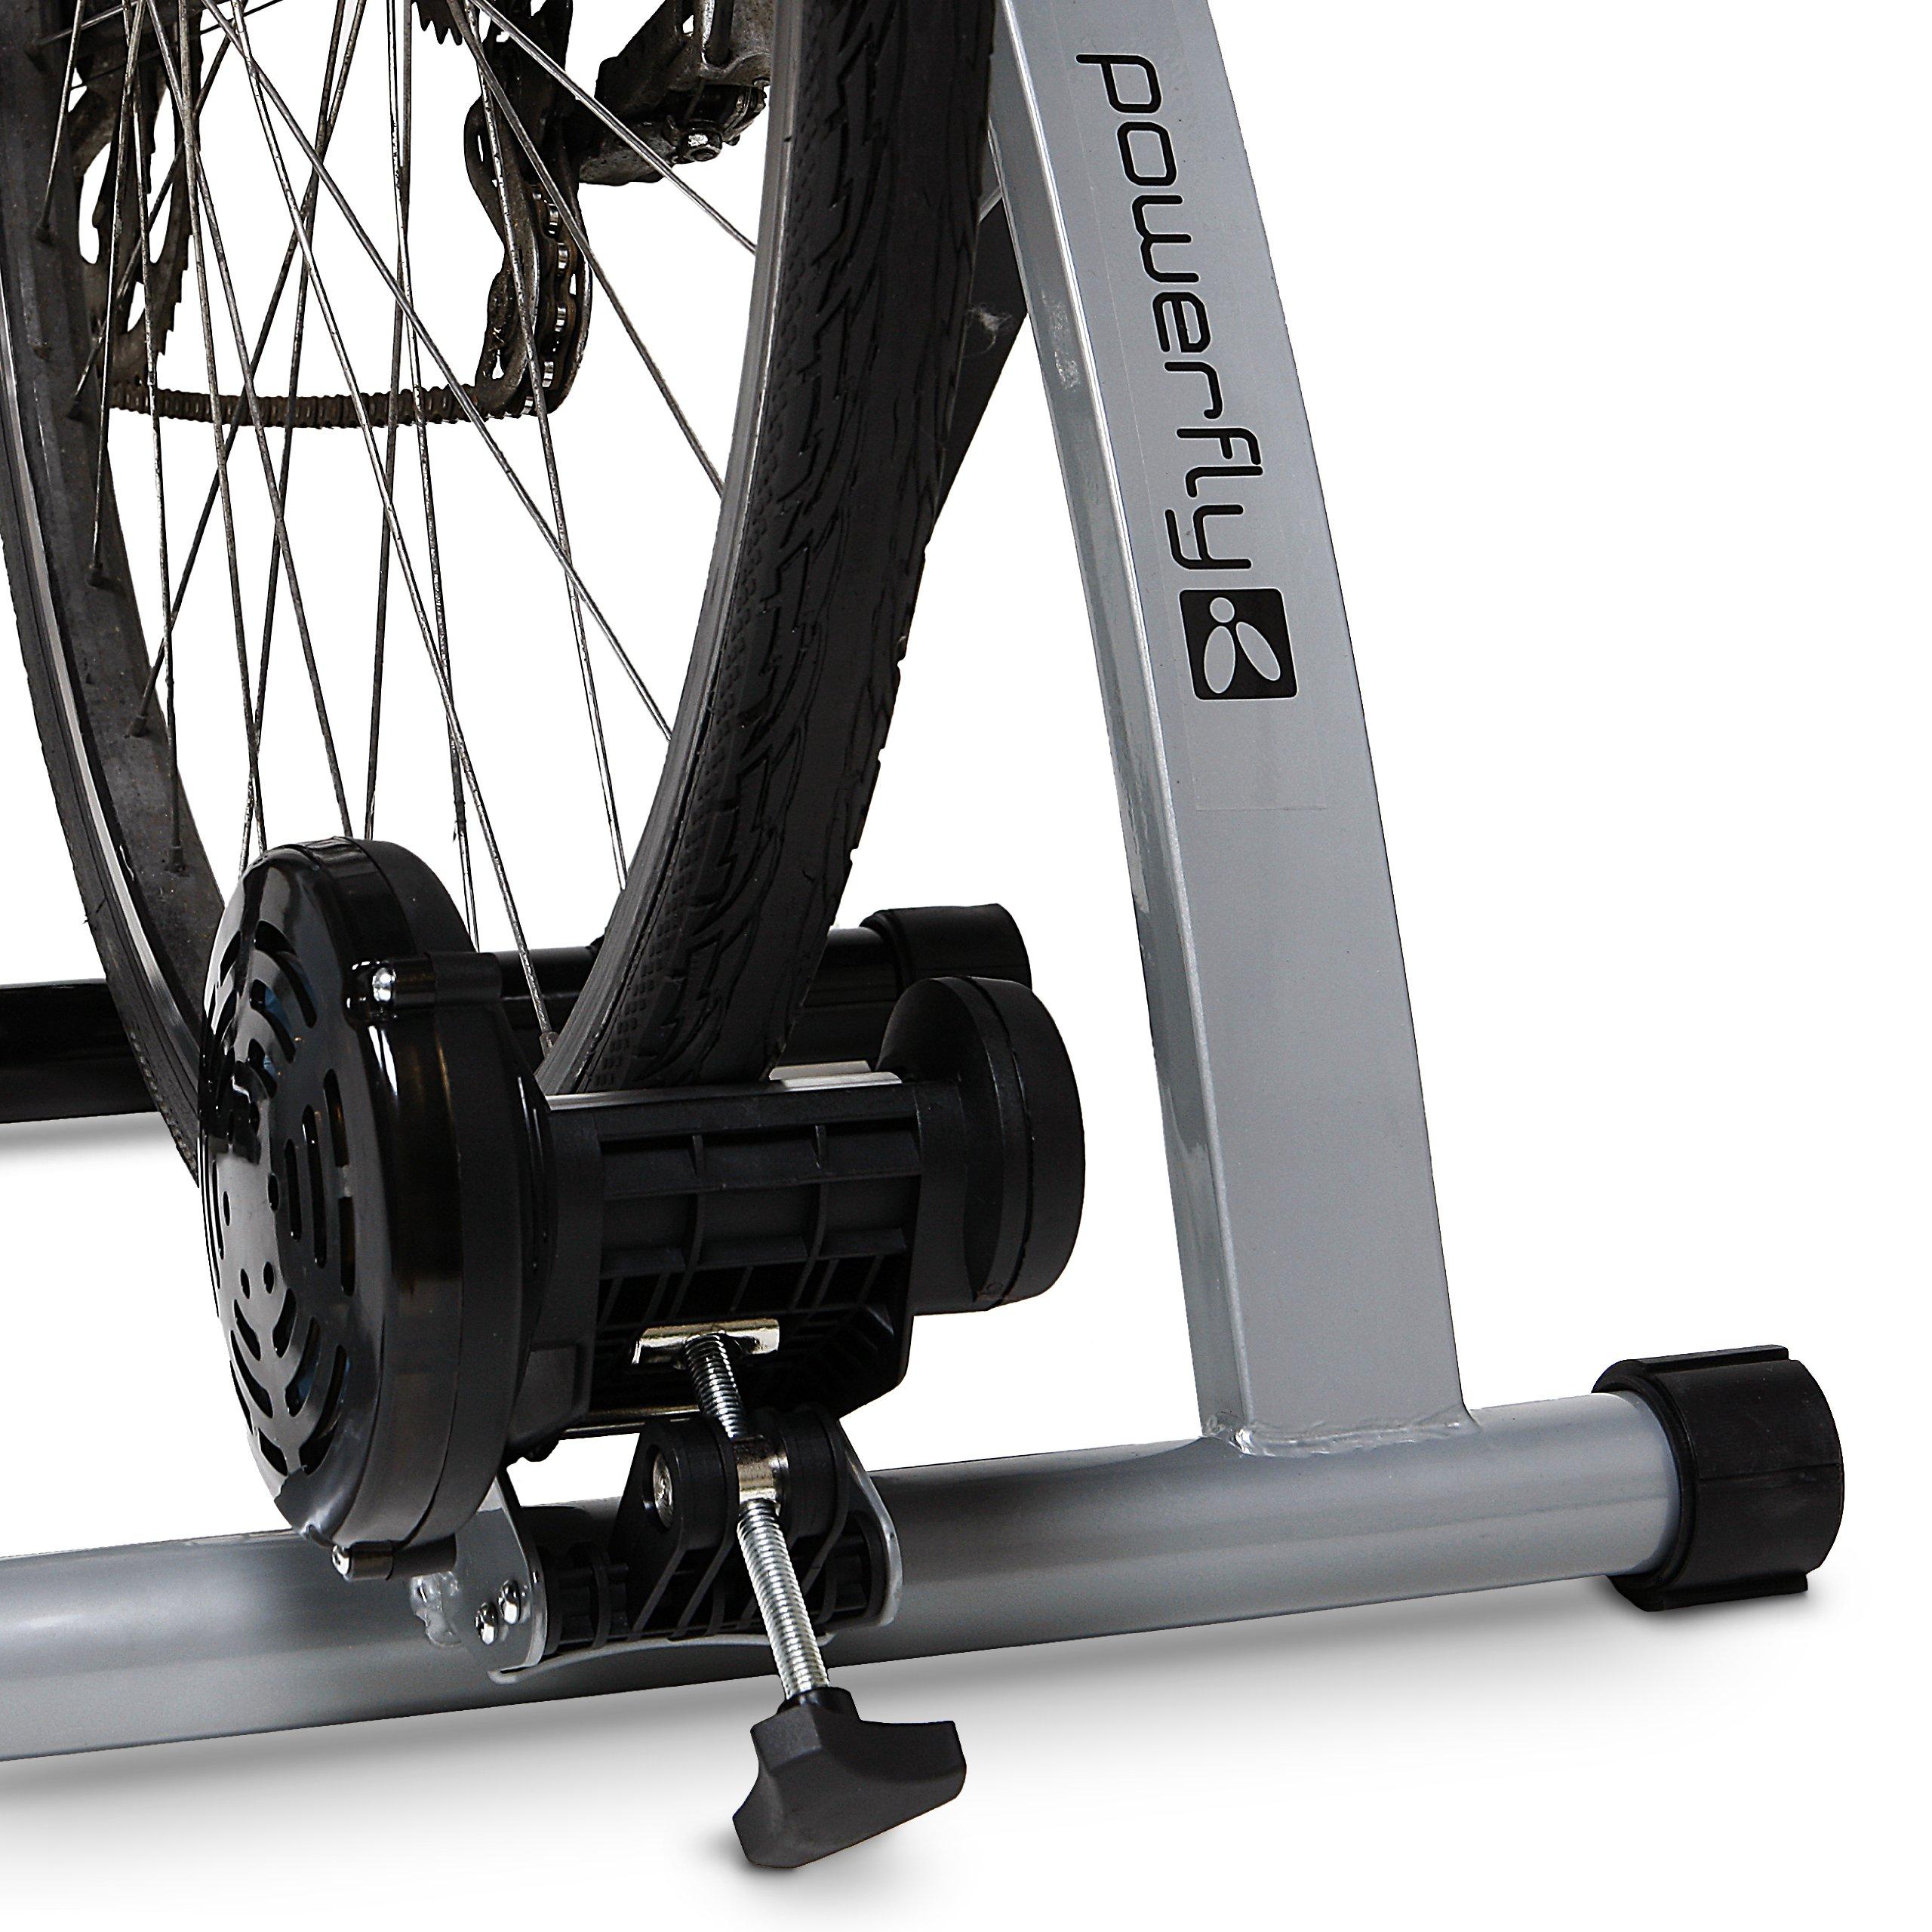 Powerfly Simulador de Bicicleta Rodillo Magnético Turbo para ...